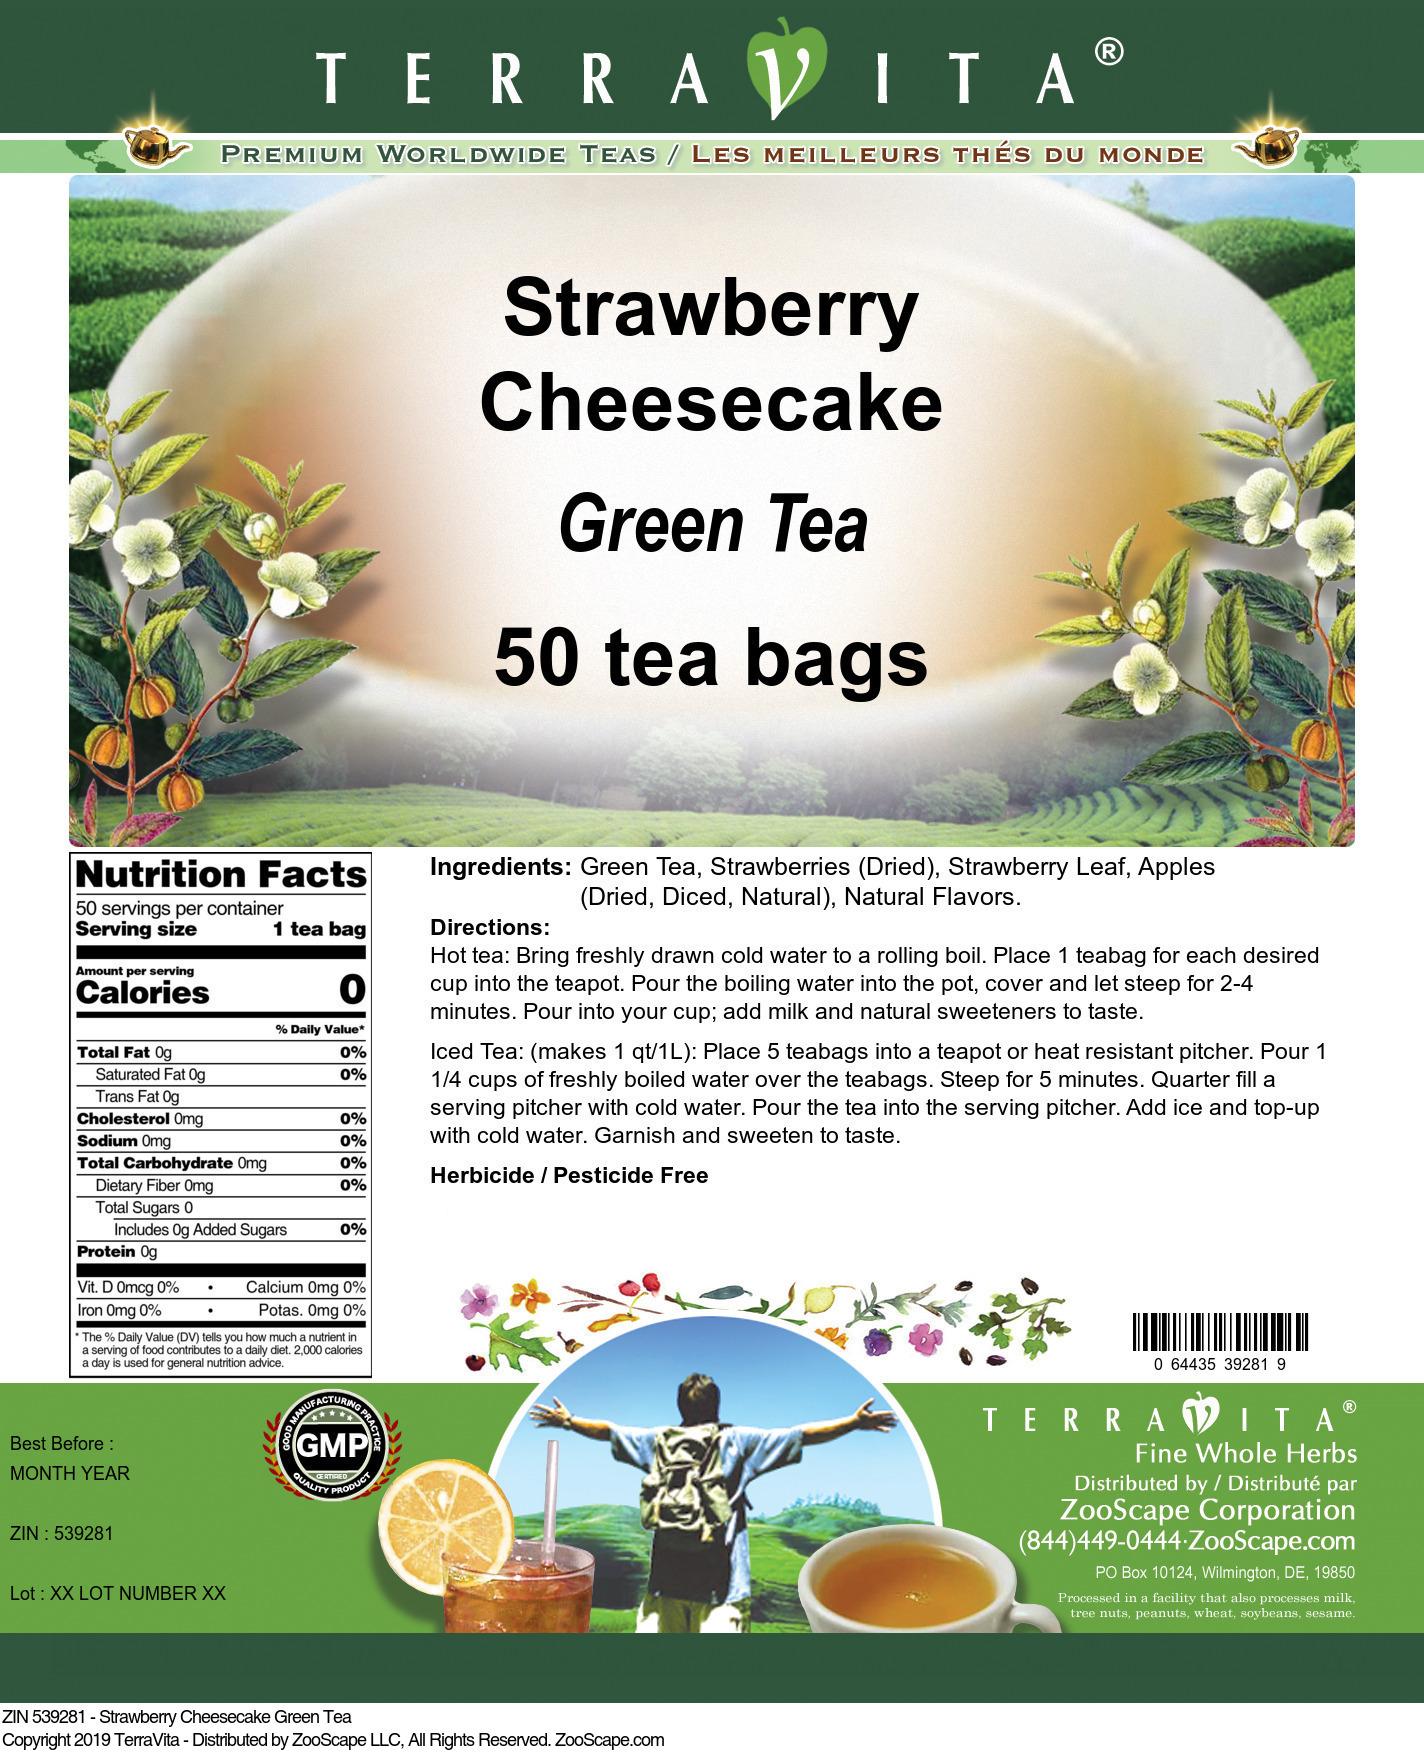 Strawberry Cheesecake Green Tea